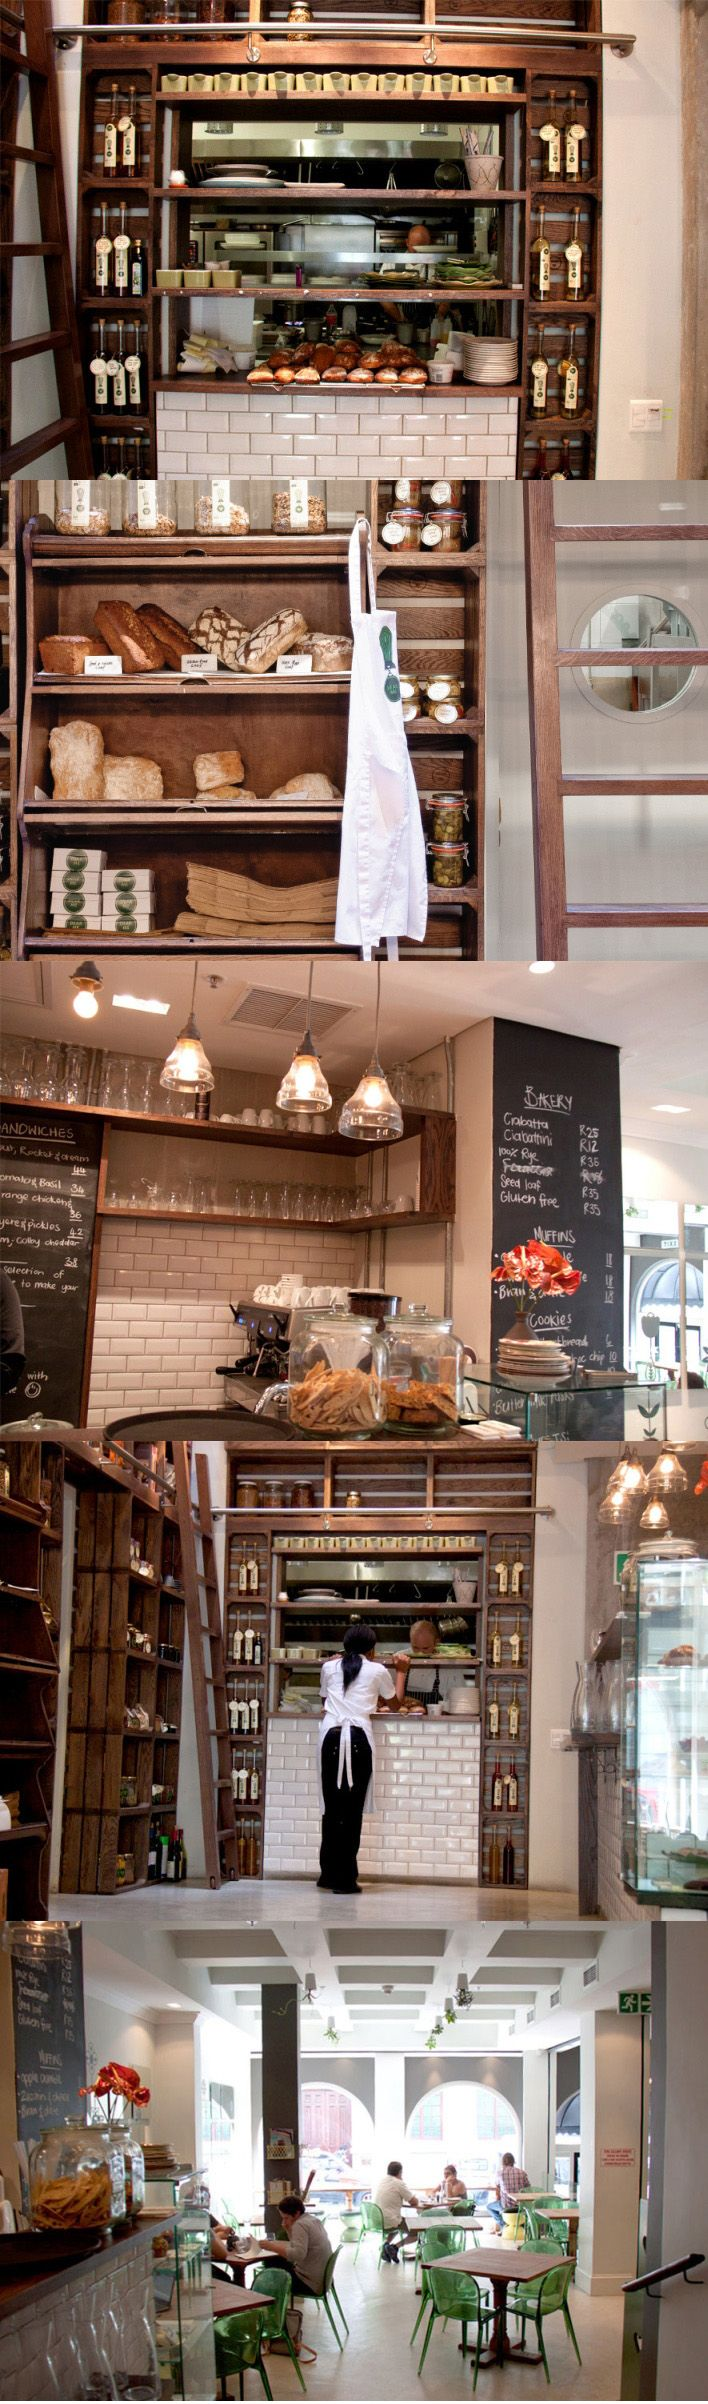 dear me cafe deli like white subway tiles. & chalk board wall menu